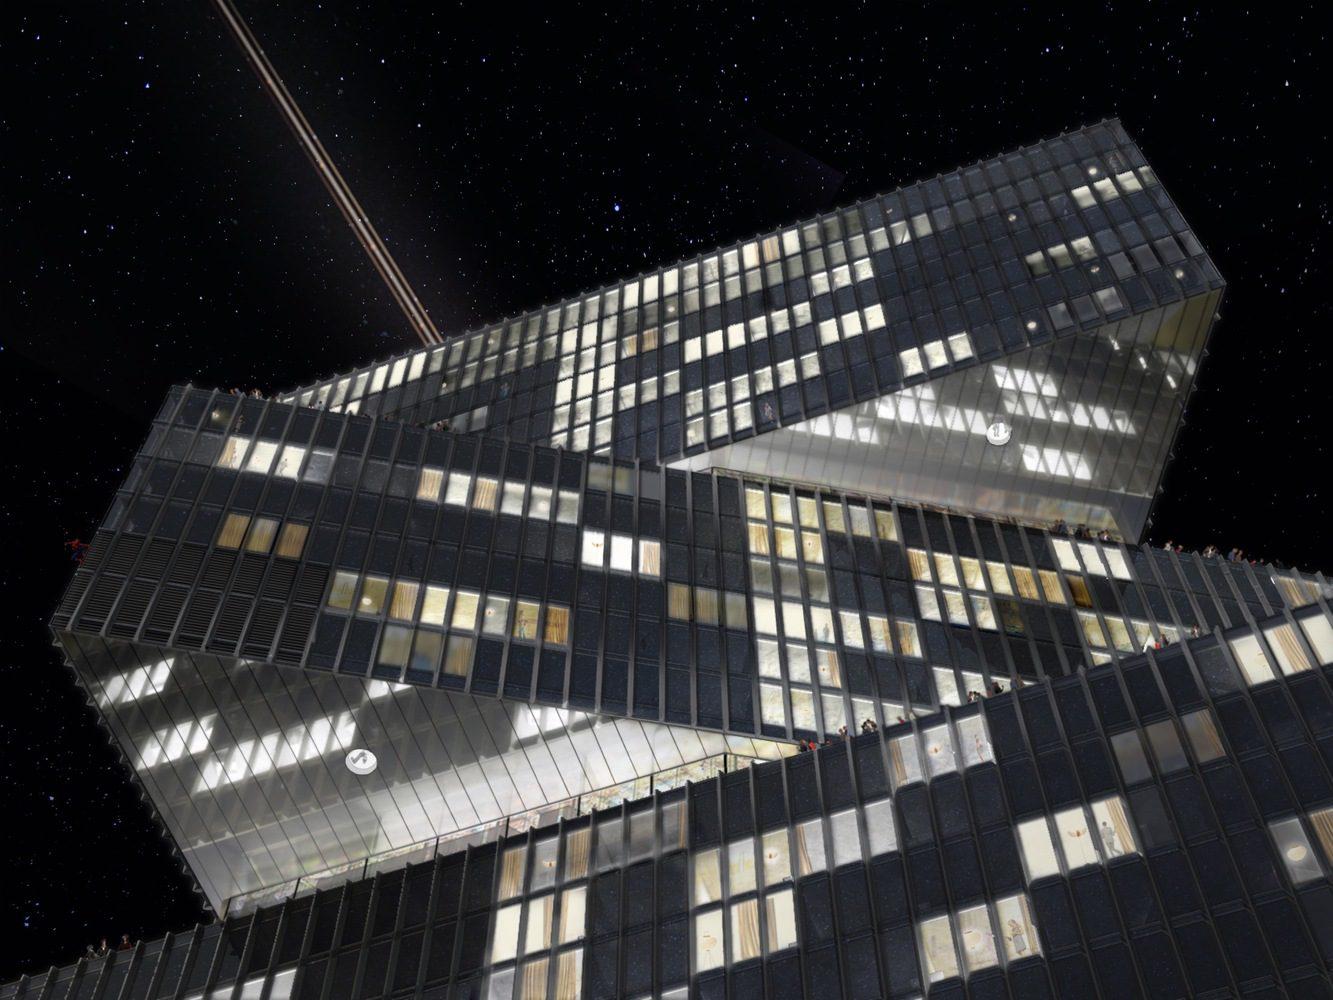 OMA-Reinier de Graaf's Nhow Amsterdam RAI Hotel Tops Out-igs magazine-7